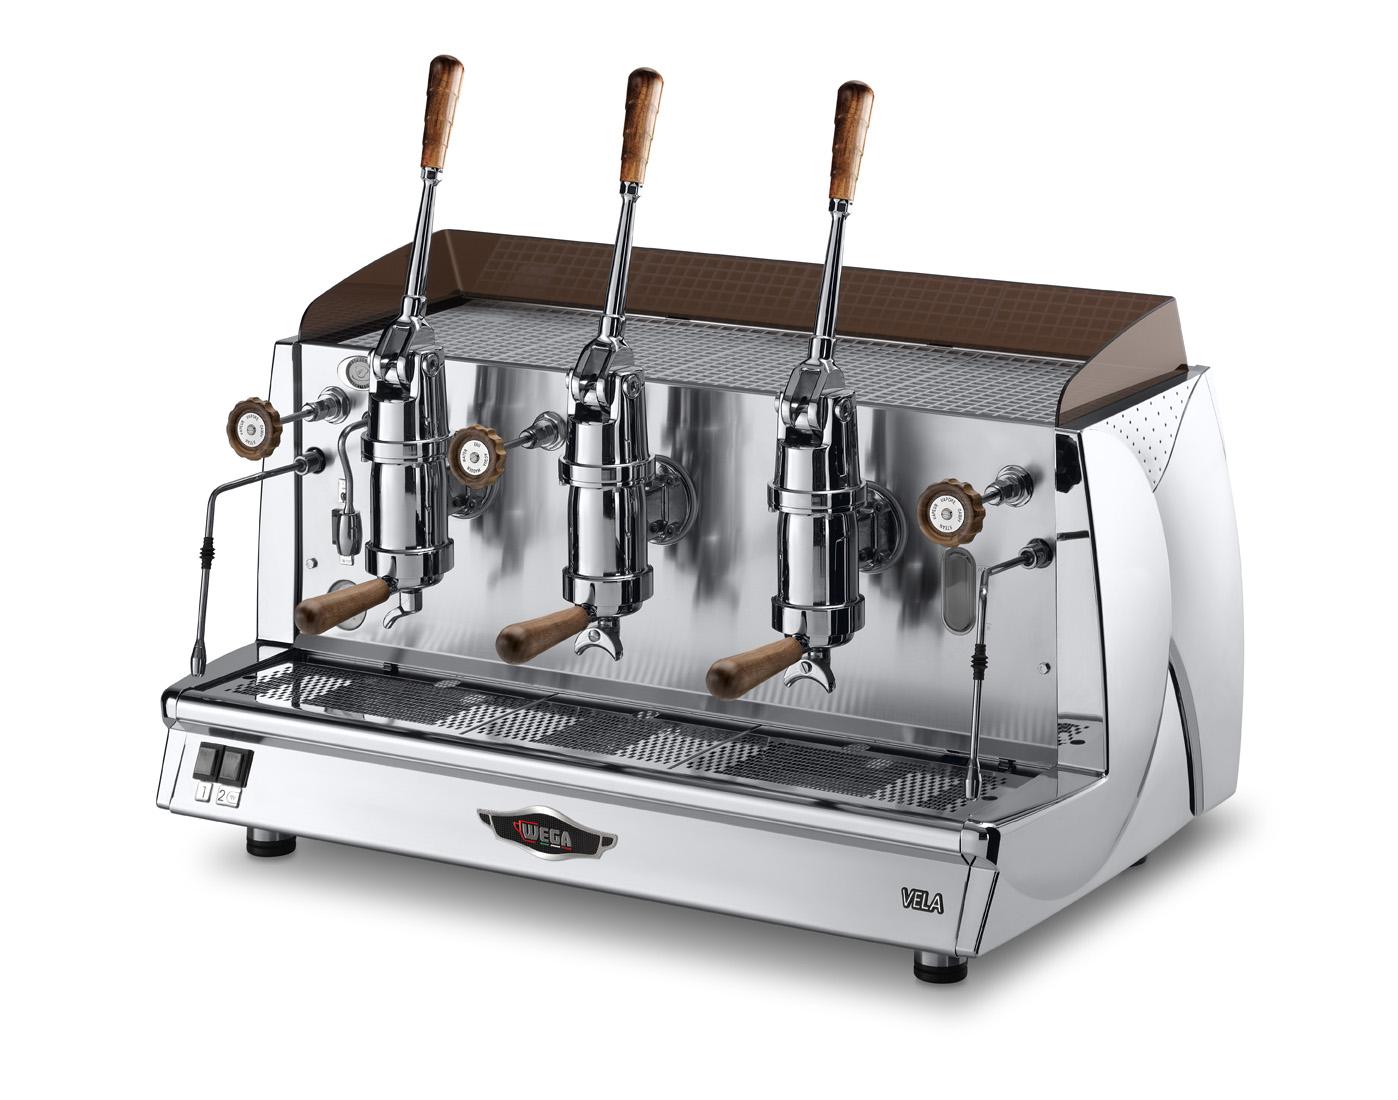 Siebträgermaschine WEGA Vela Vintage - Kaffeemaschinen Göppingen | Rocco Secco